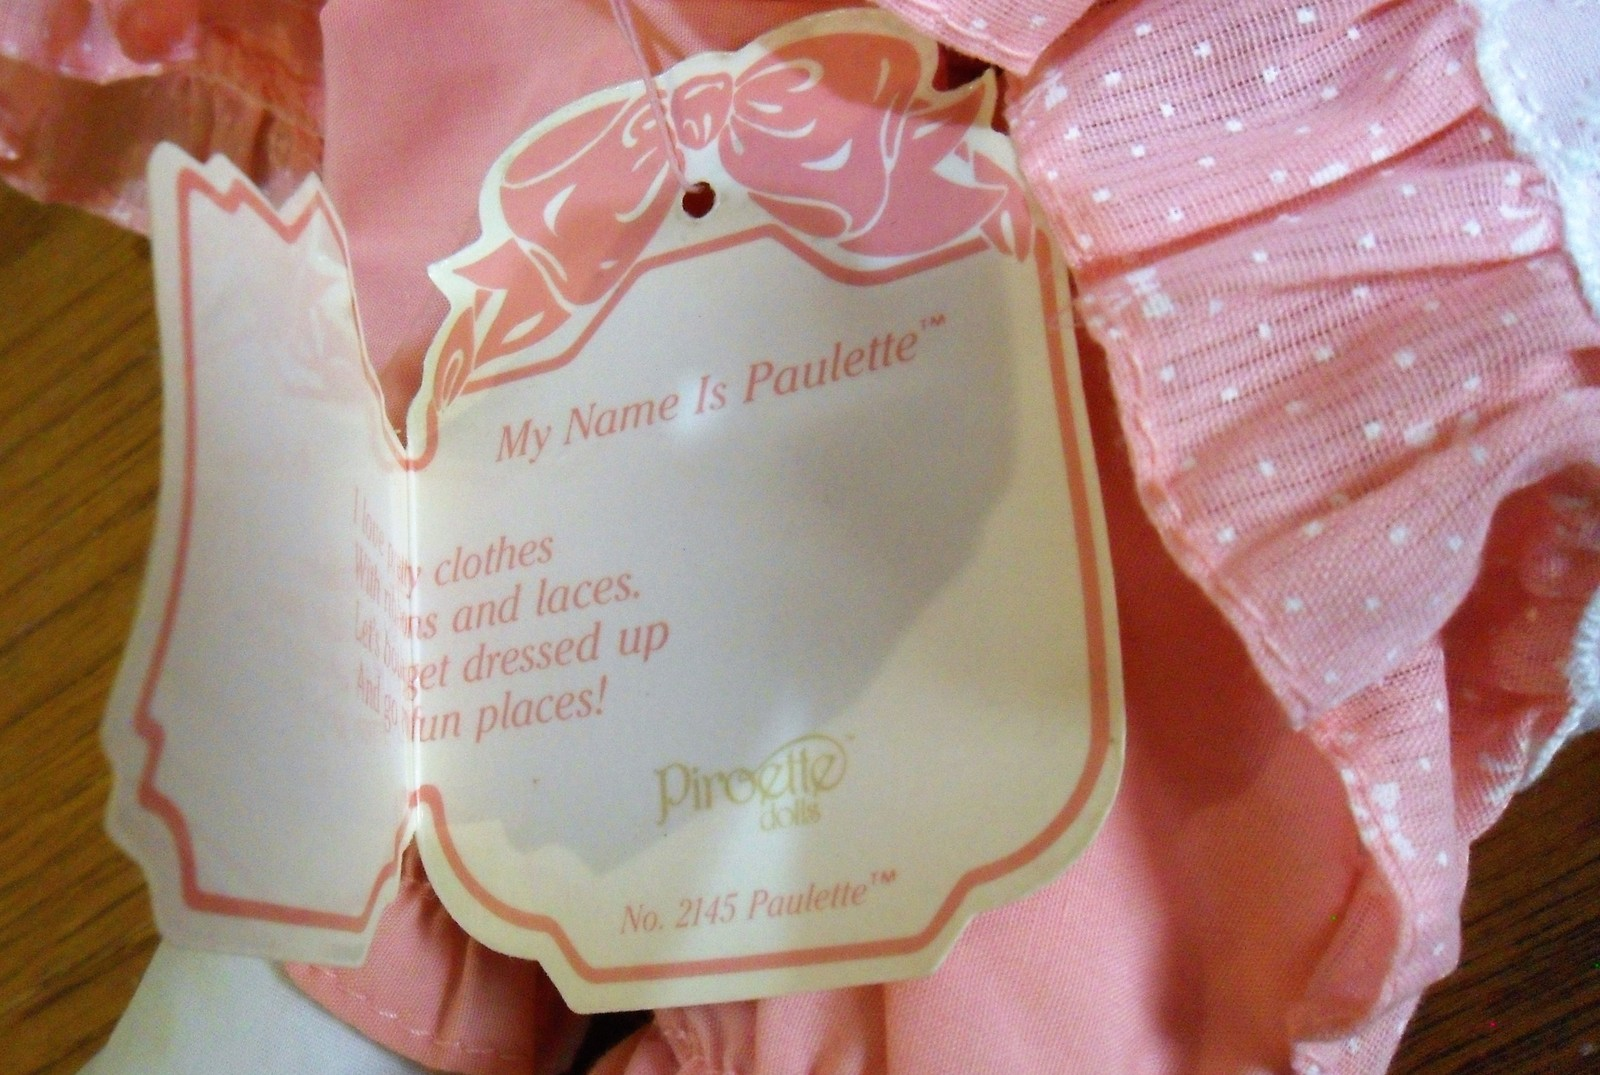 Vintage 1984 PAULETTE Piroette APPLAUSE Plush RAG DOLL-w TAGS~2145